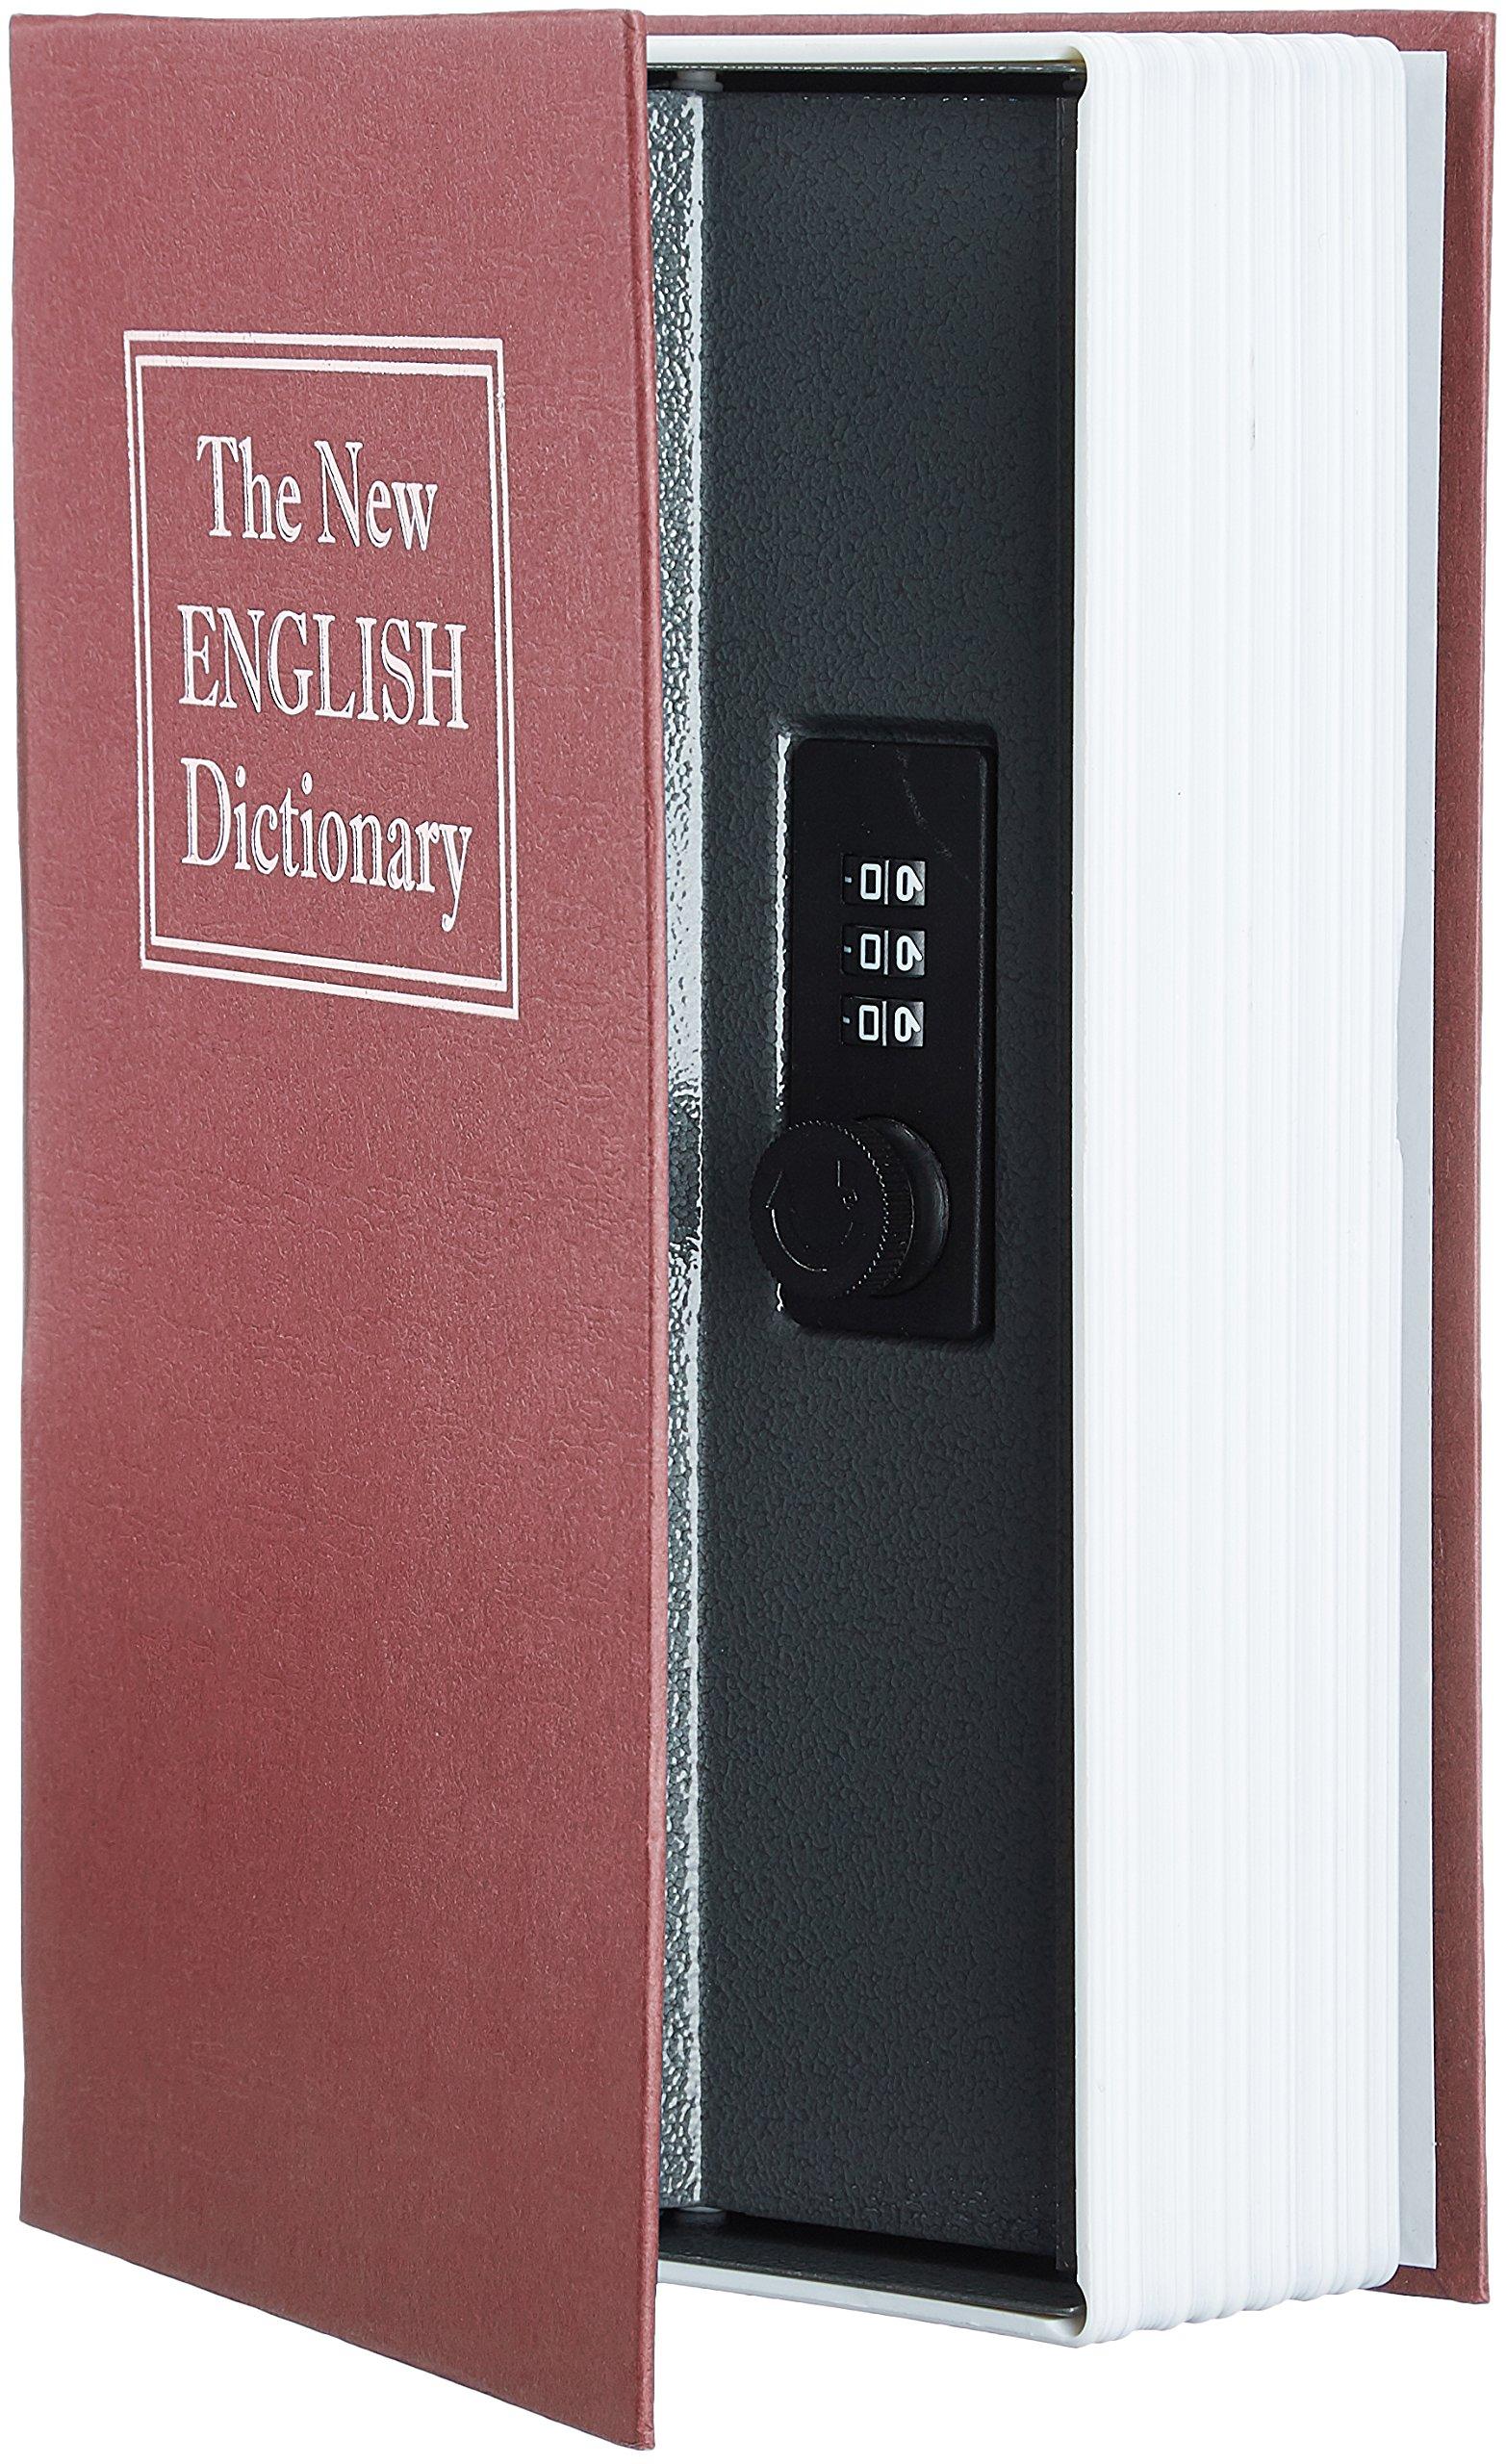 AmazonBasics Book Safe, Combination Lock, Red by AmazonBasics